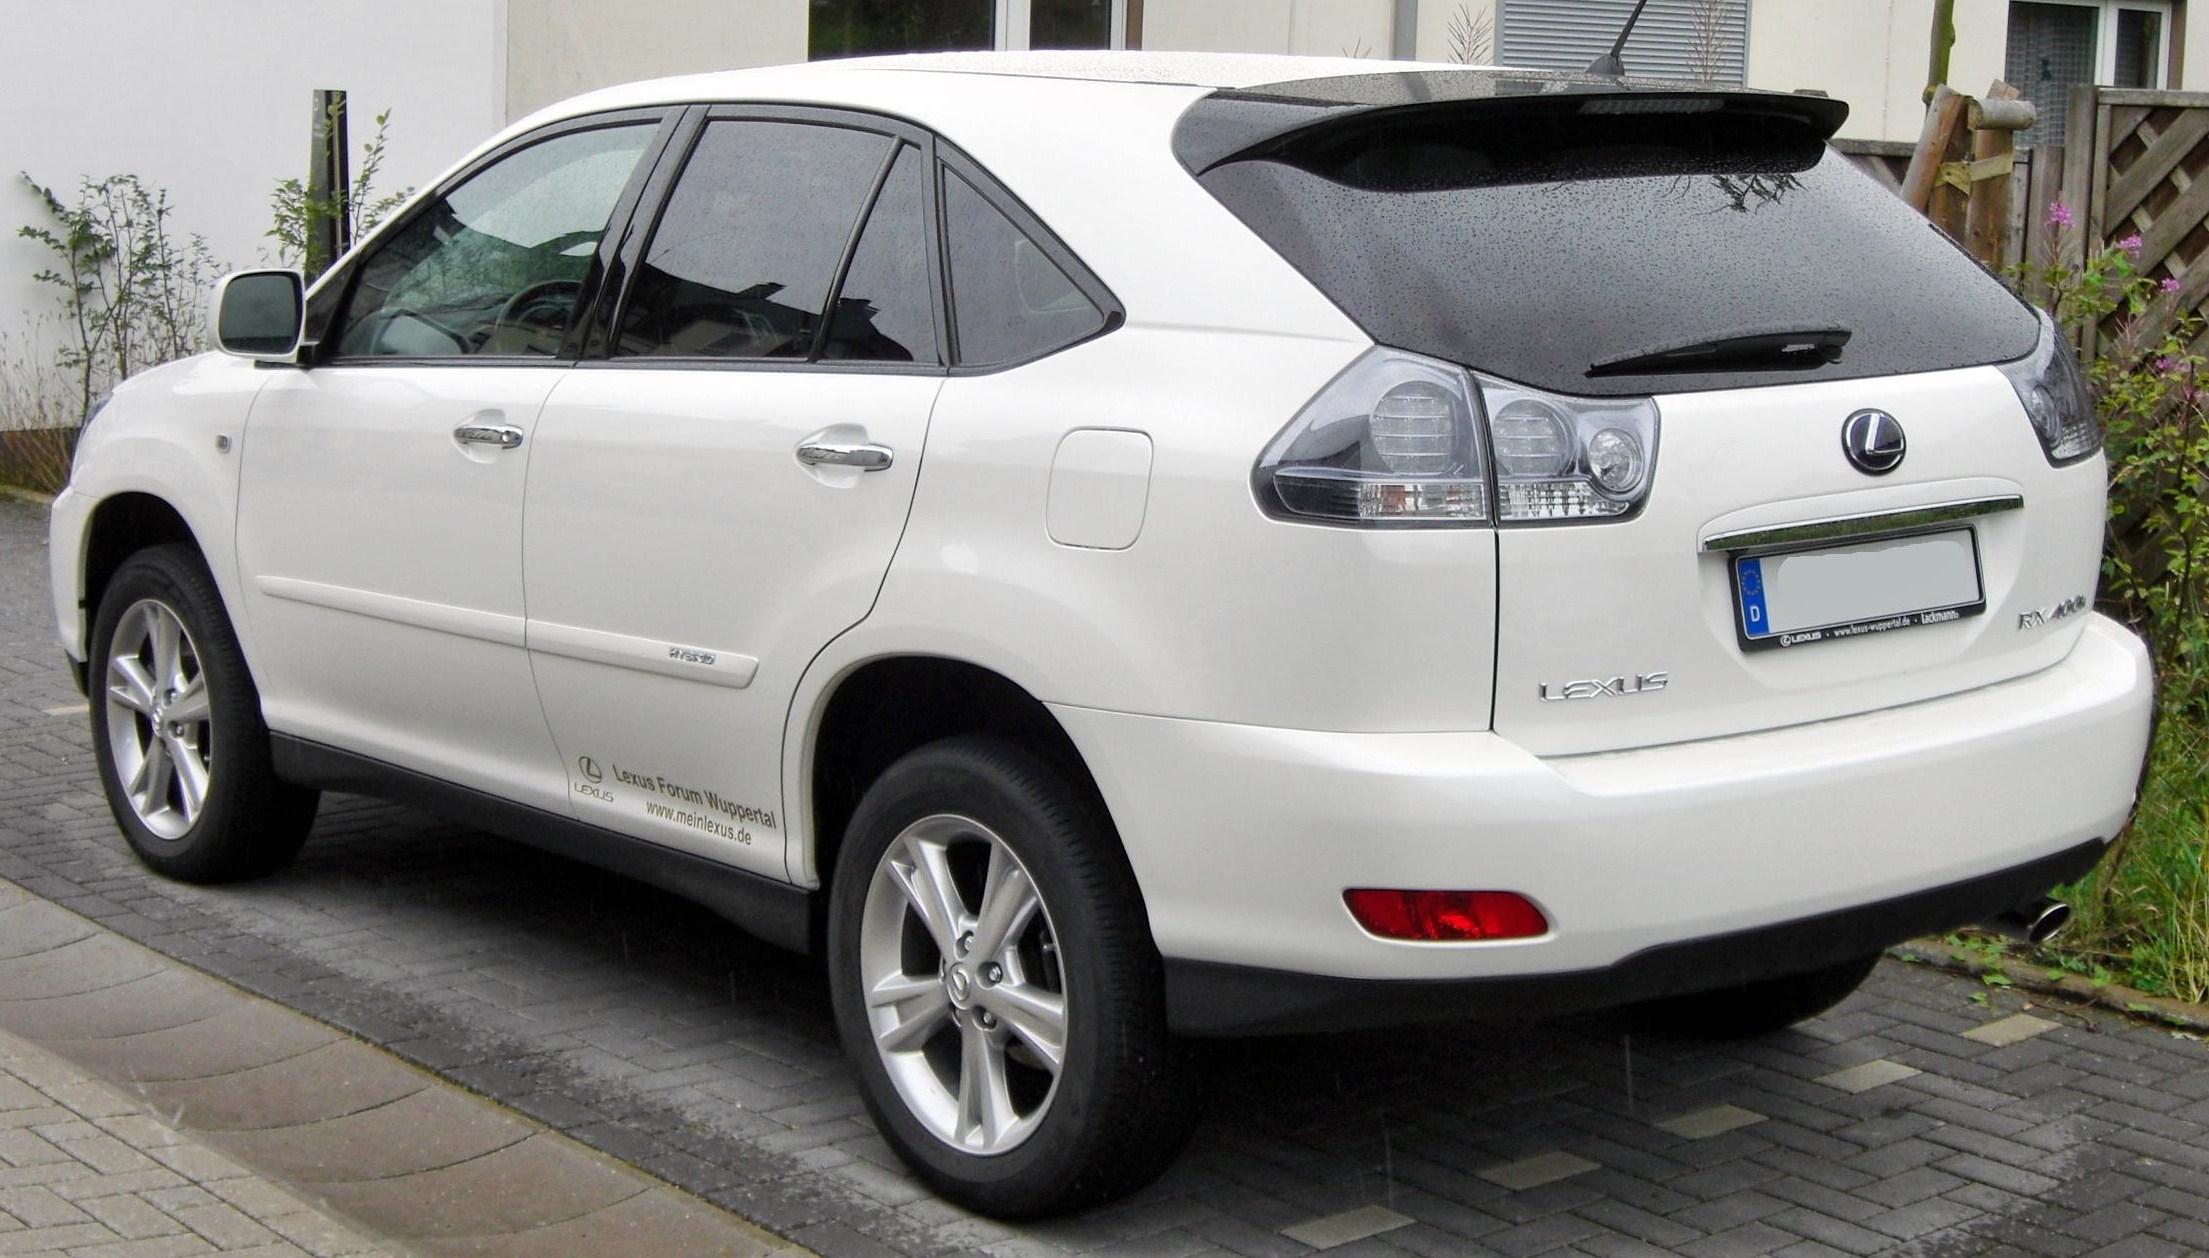 Lexus_RX_400h_rear